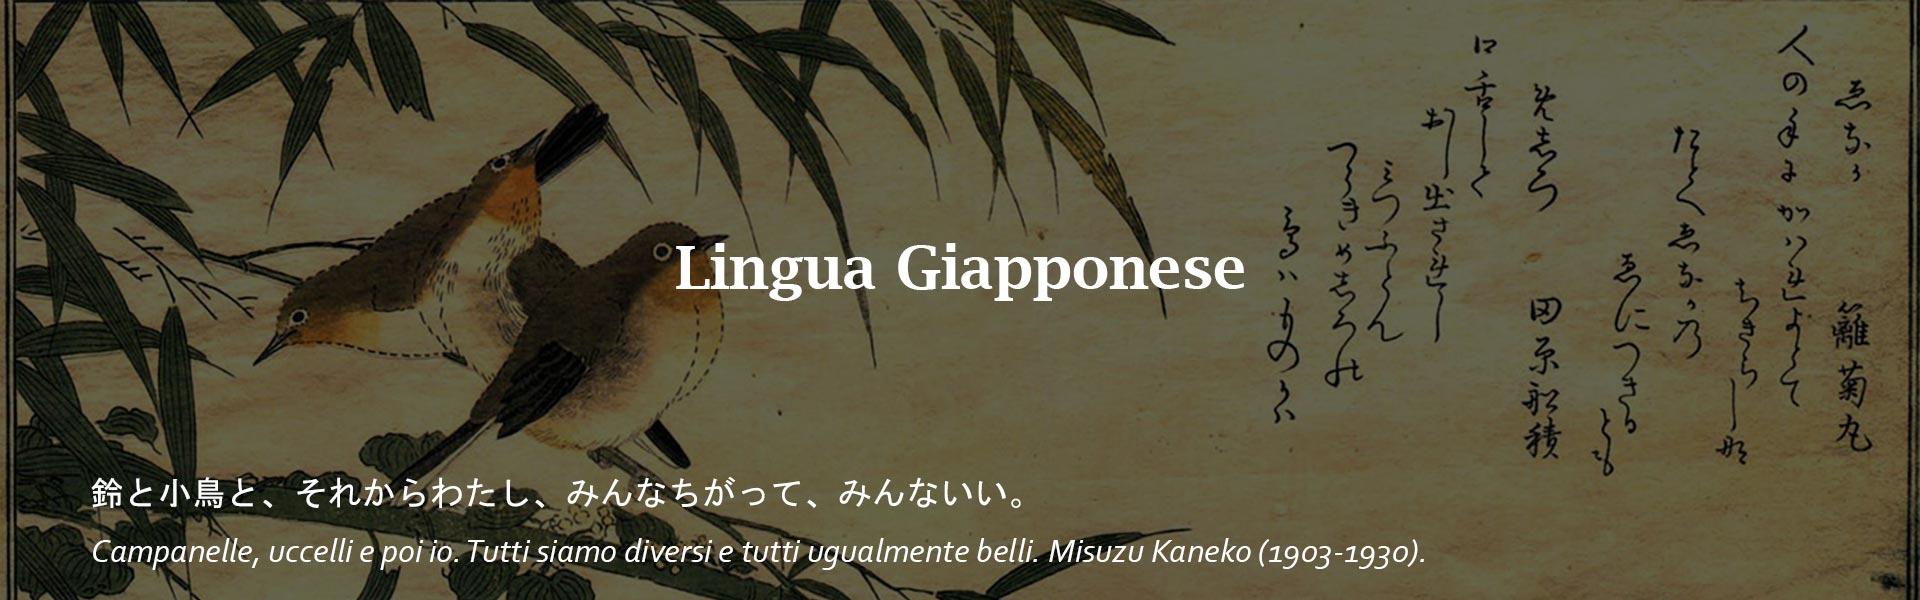 lingua-giapponese-Alif